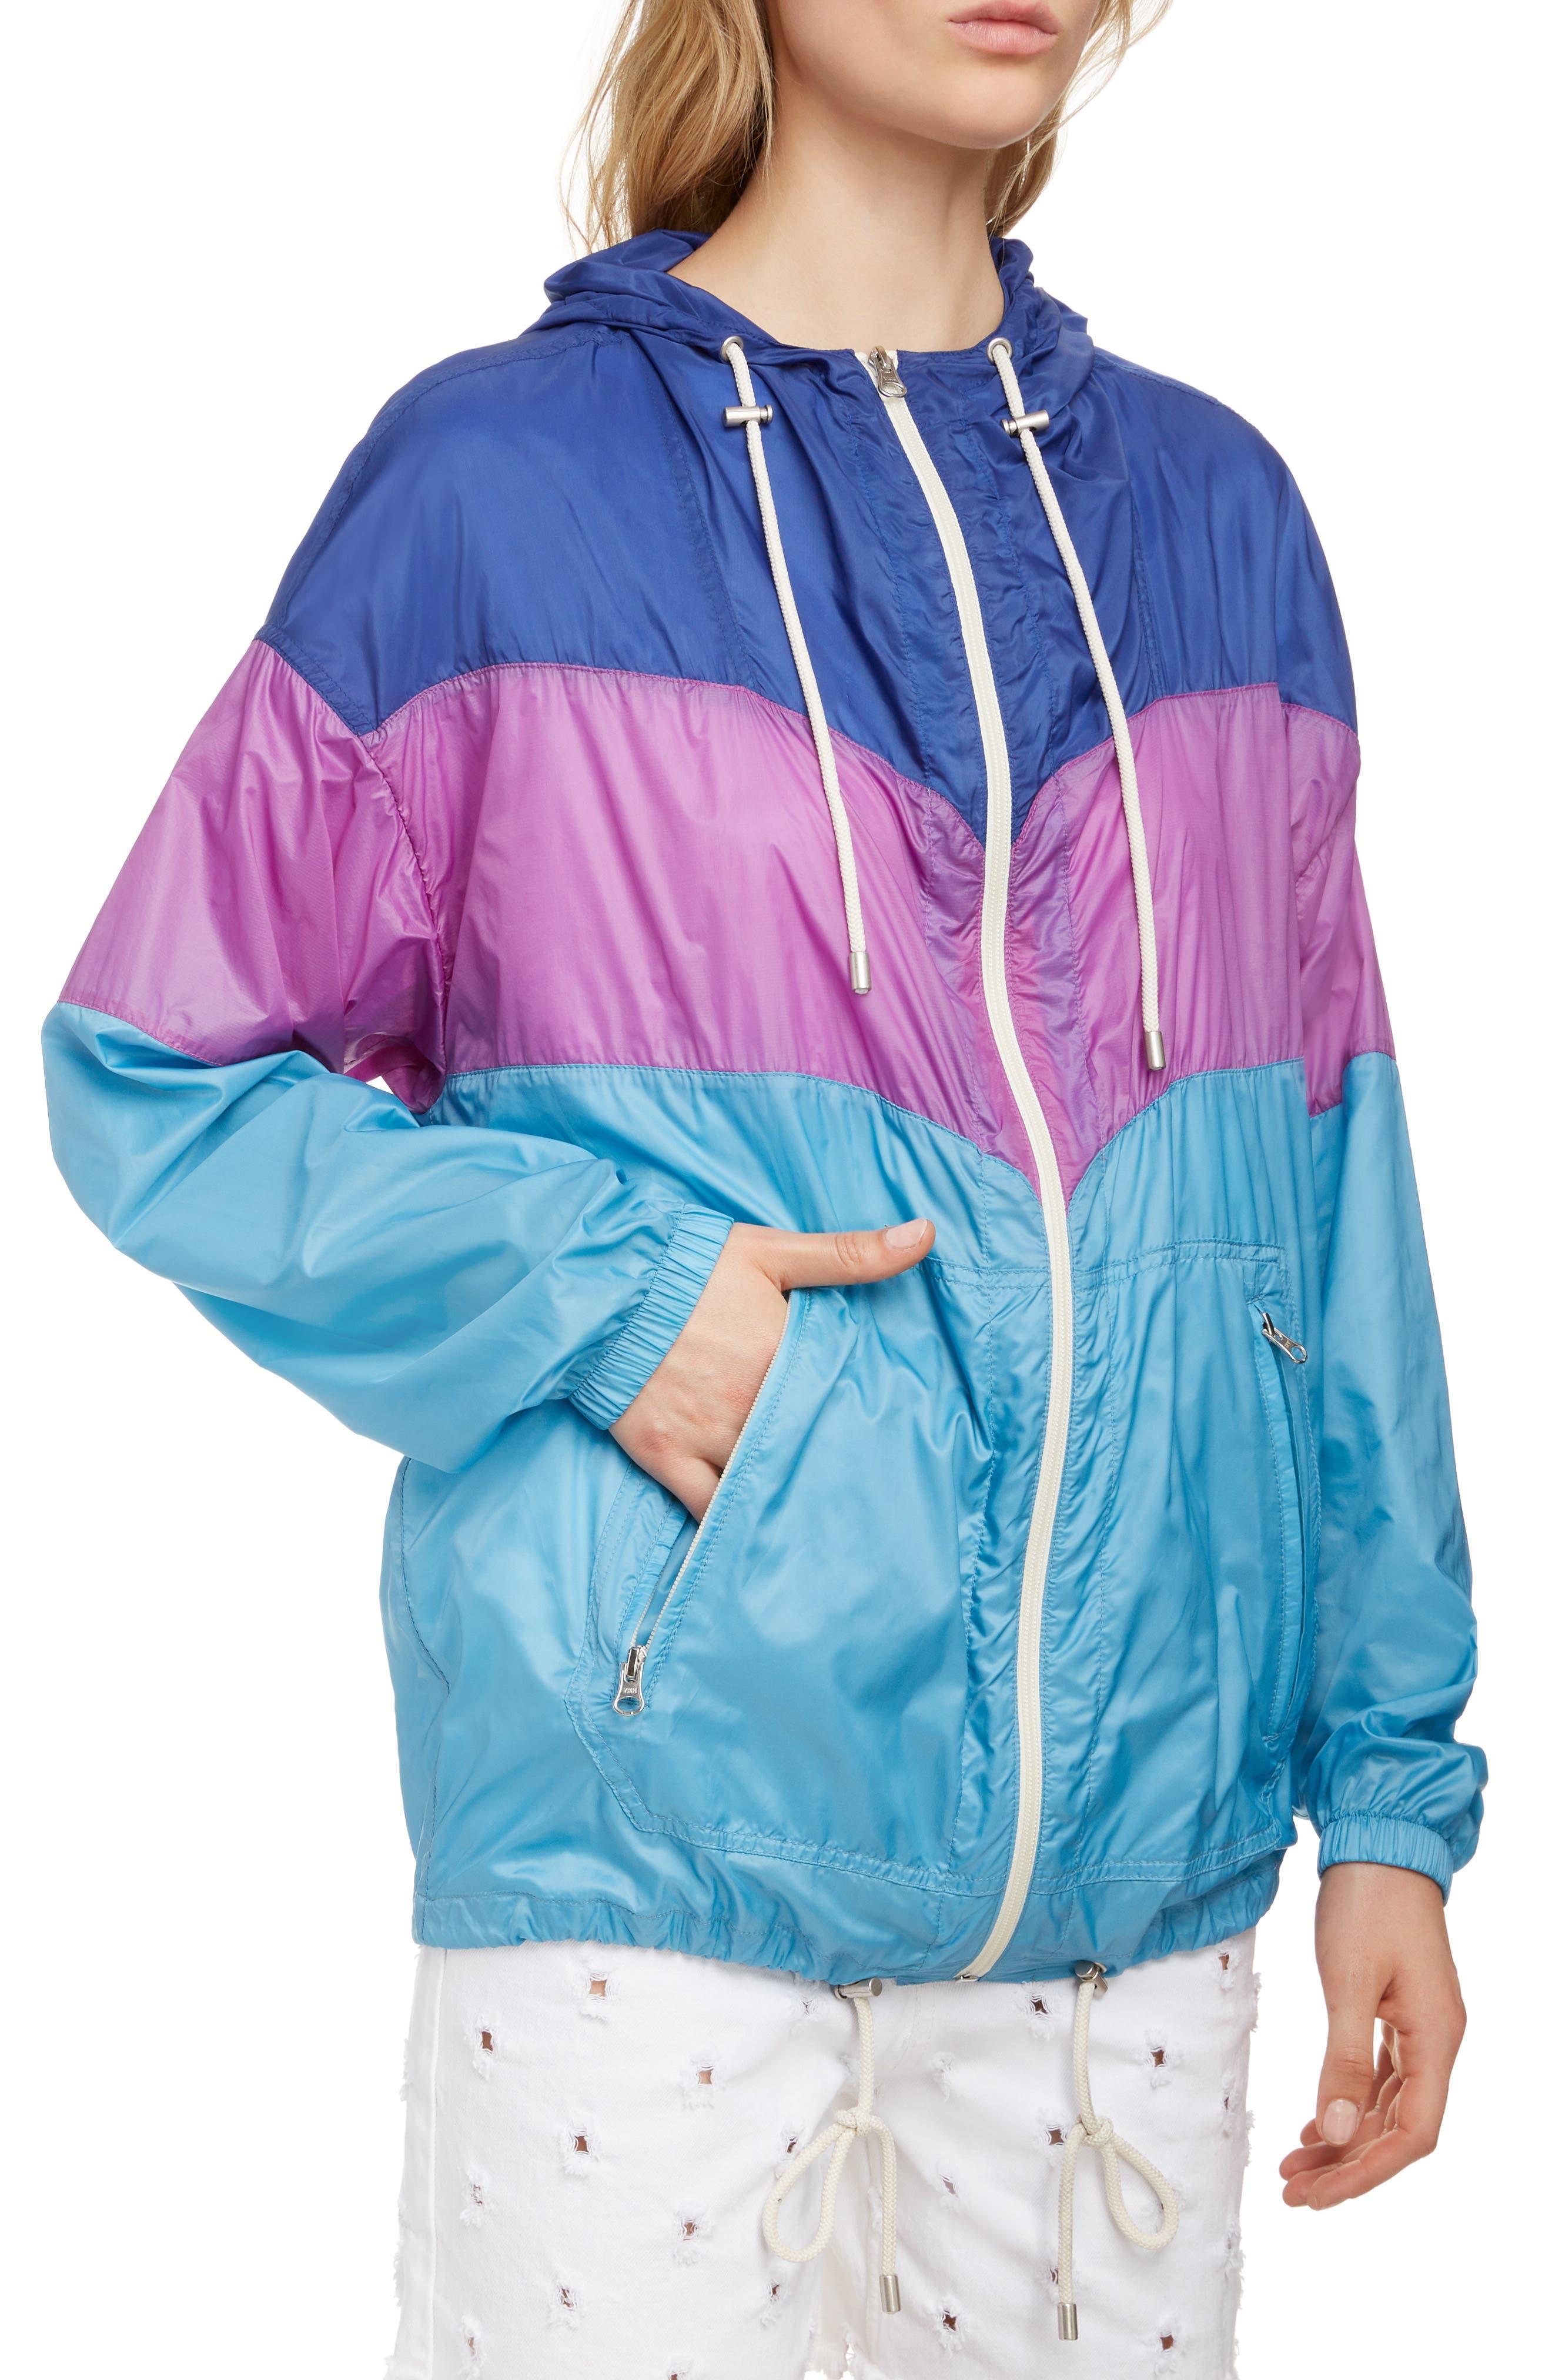 ISABEL MARANT ÉTOILE, Kyriel Colorblock Hooded Jacket, Alternate thumbnail 5, color, ELECTRIC BLUE/ VIOLET